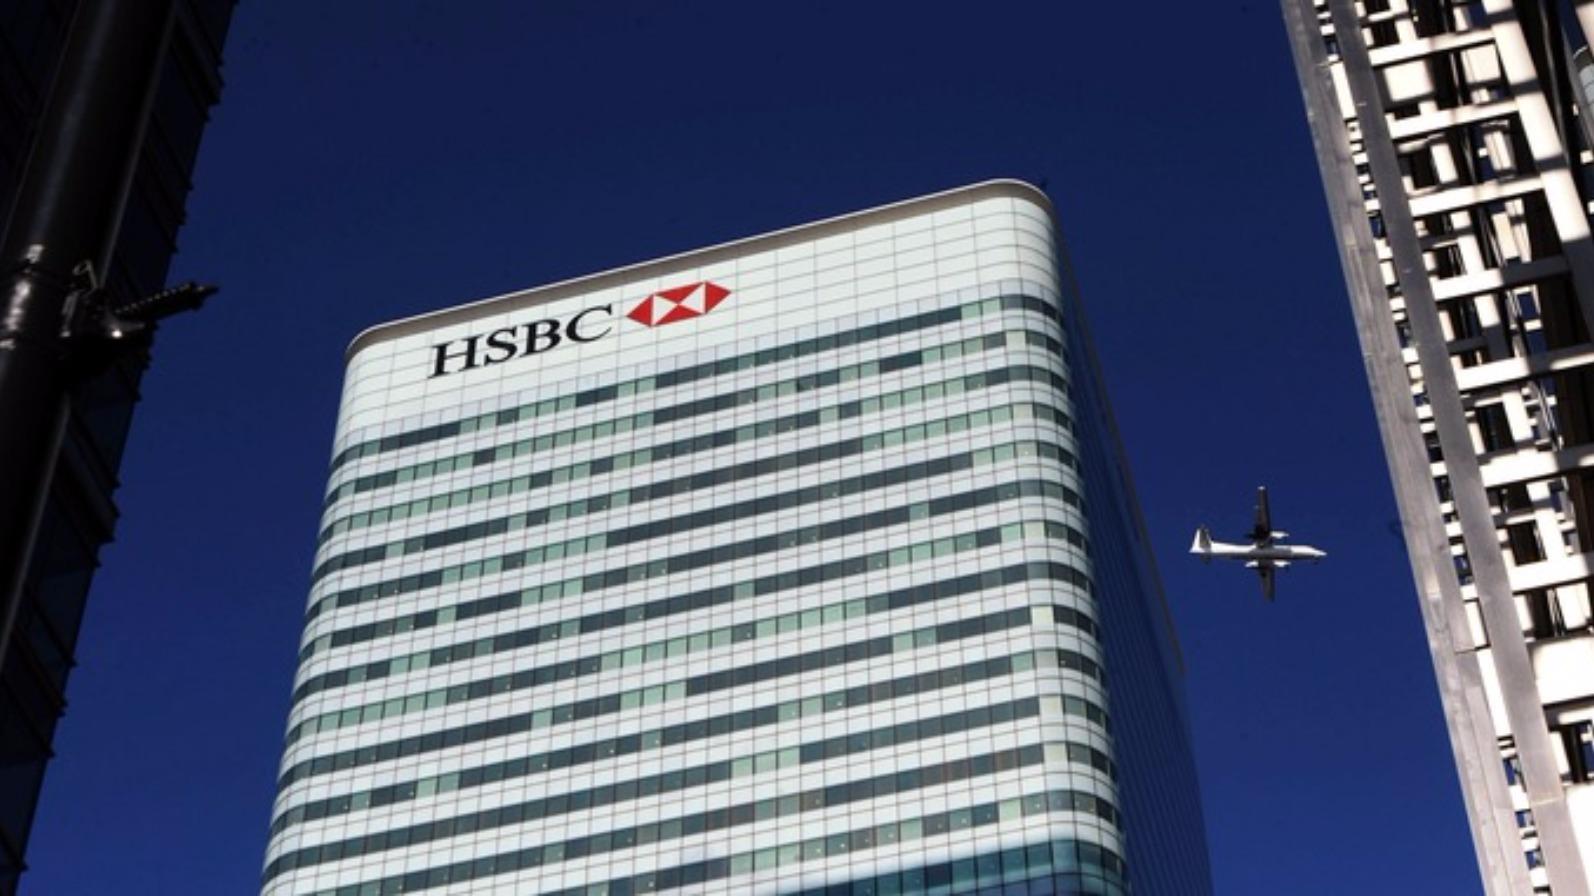 Hsbc Confirms Between 7 000 And 8 000 Uk Job Losses Itv News